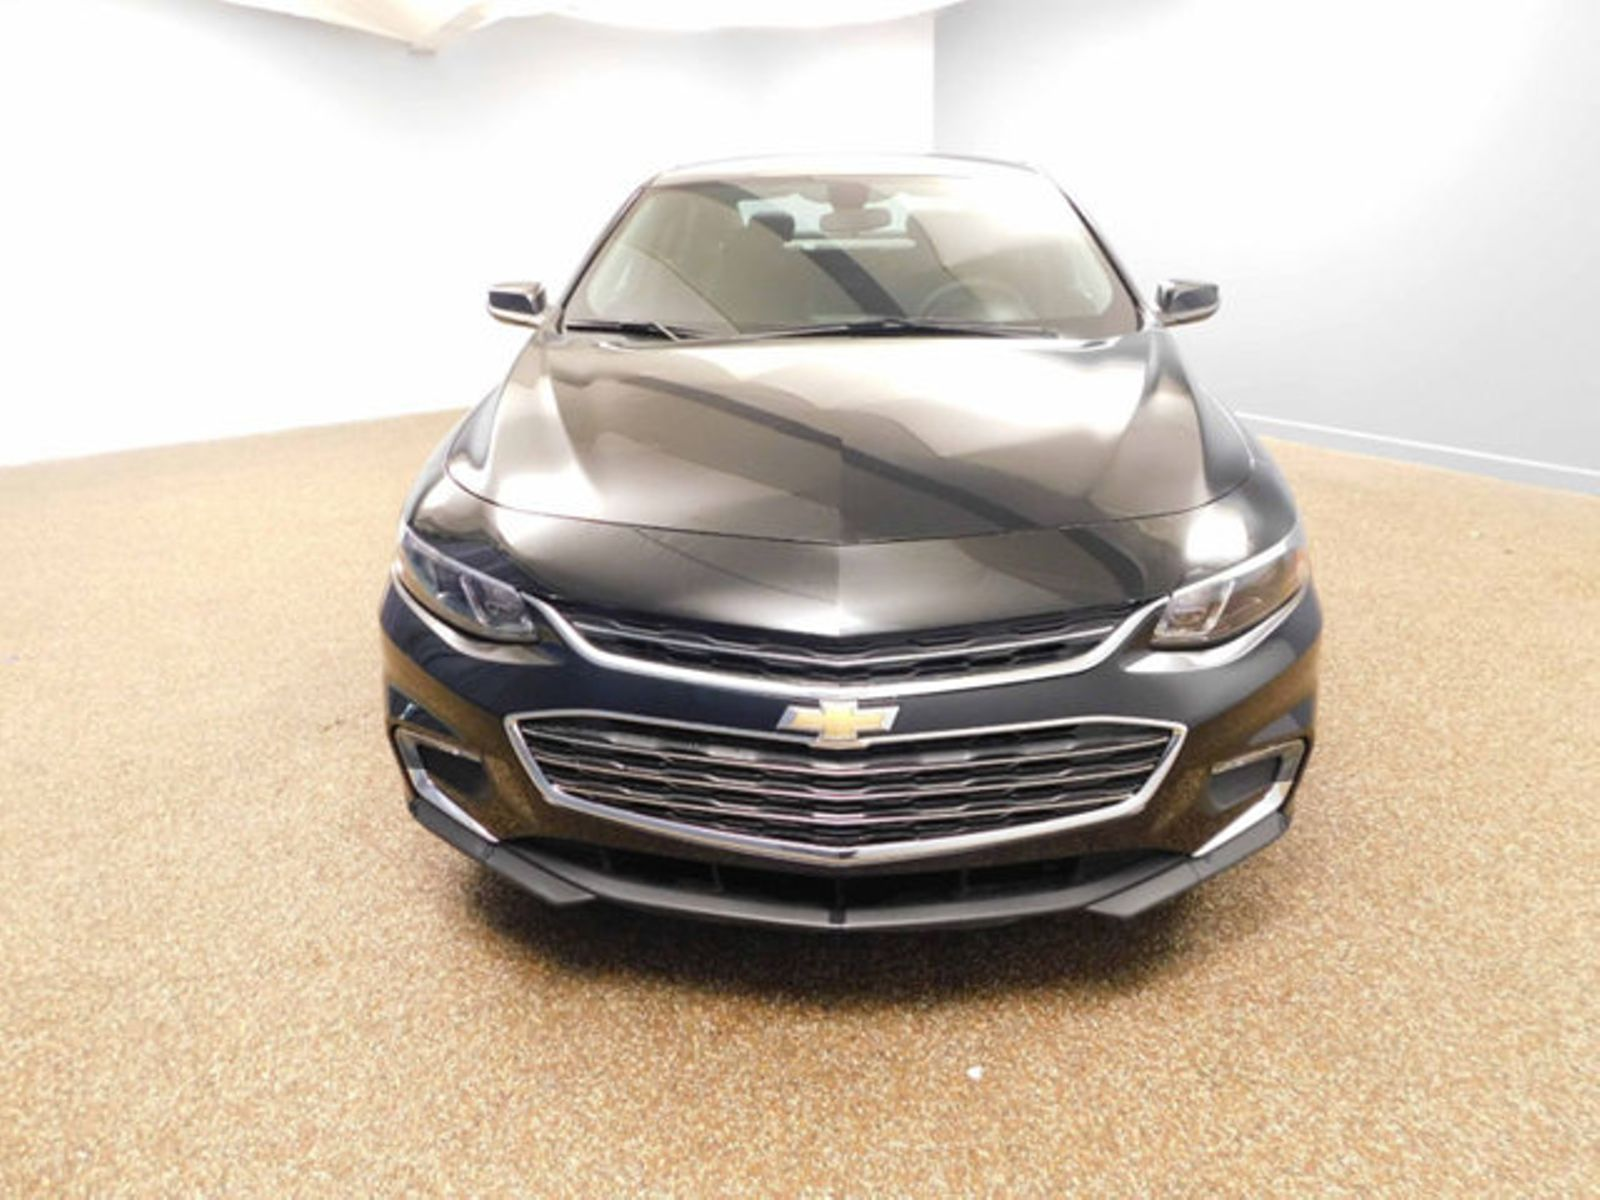 2018 Chevrolet Malibu LT city Ohio North Coast Auto Mall of Bedford